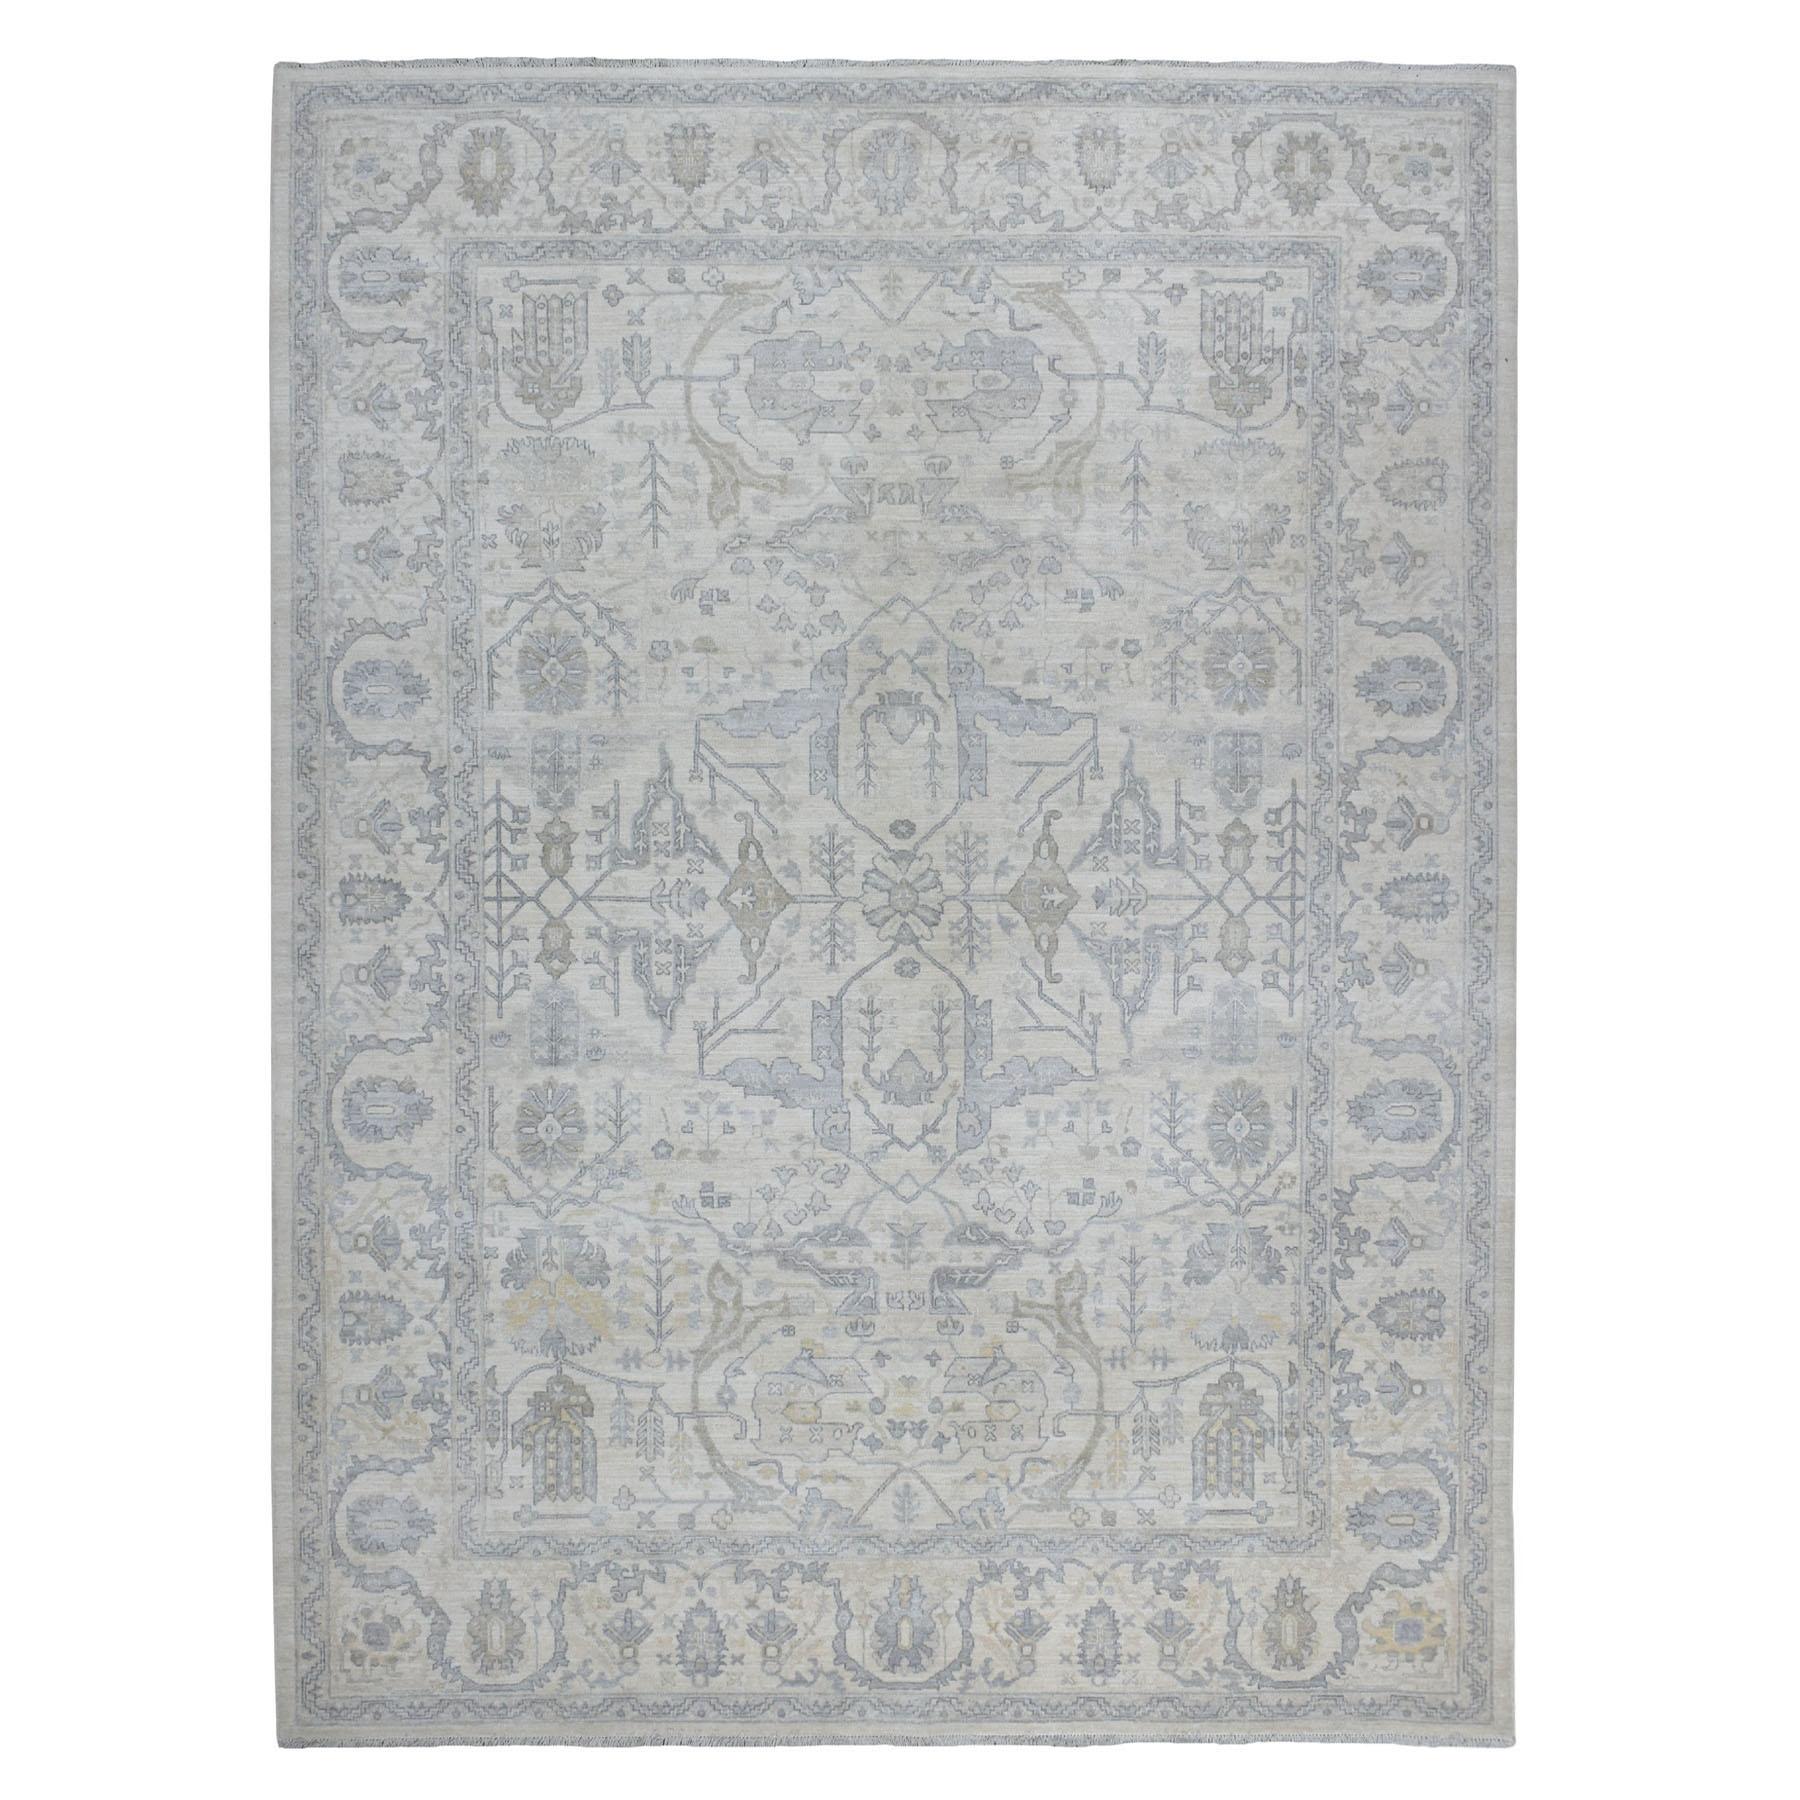 "8'9""x11'6"" White Wash Peshawar Hand Knotted Organic Wool Oriental Rug"